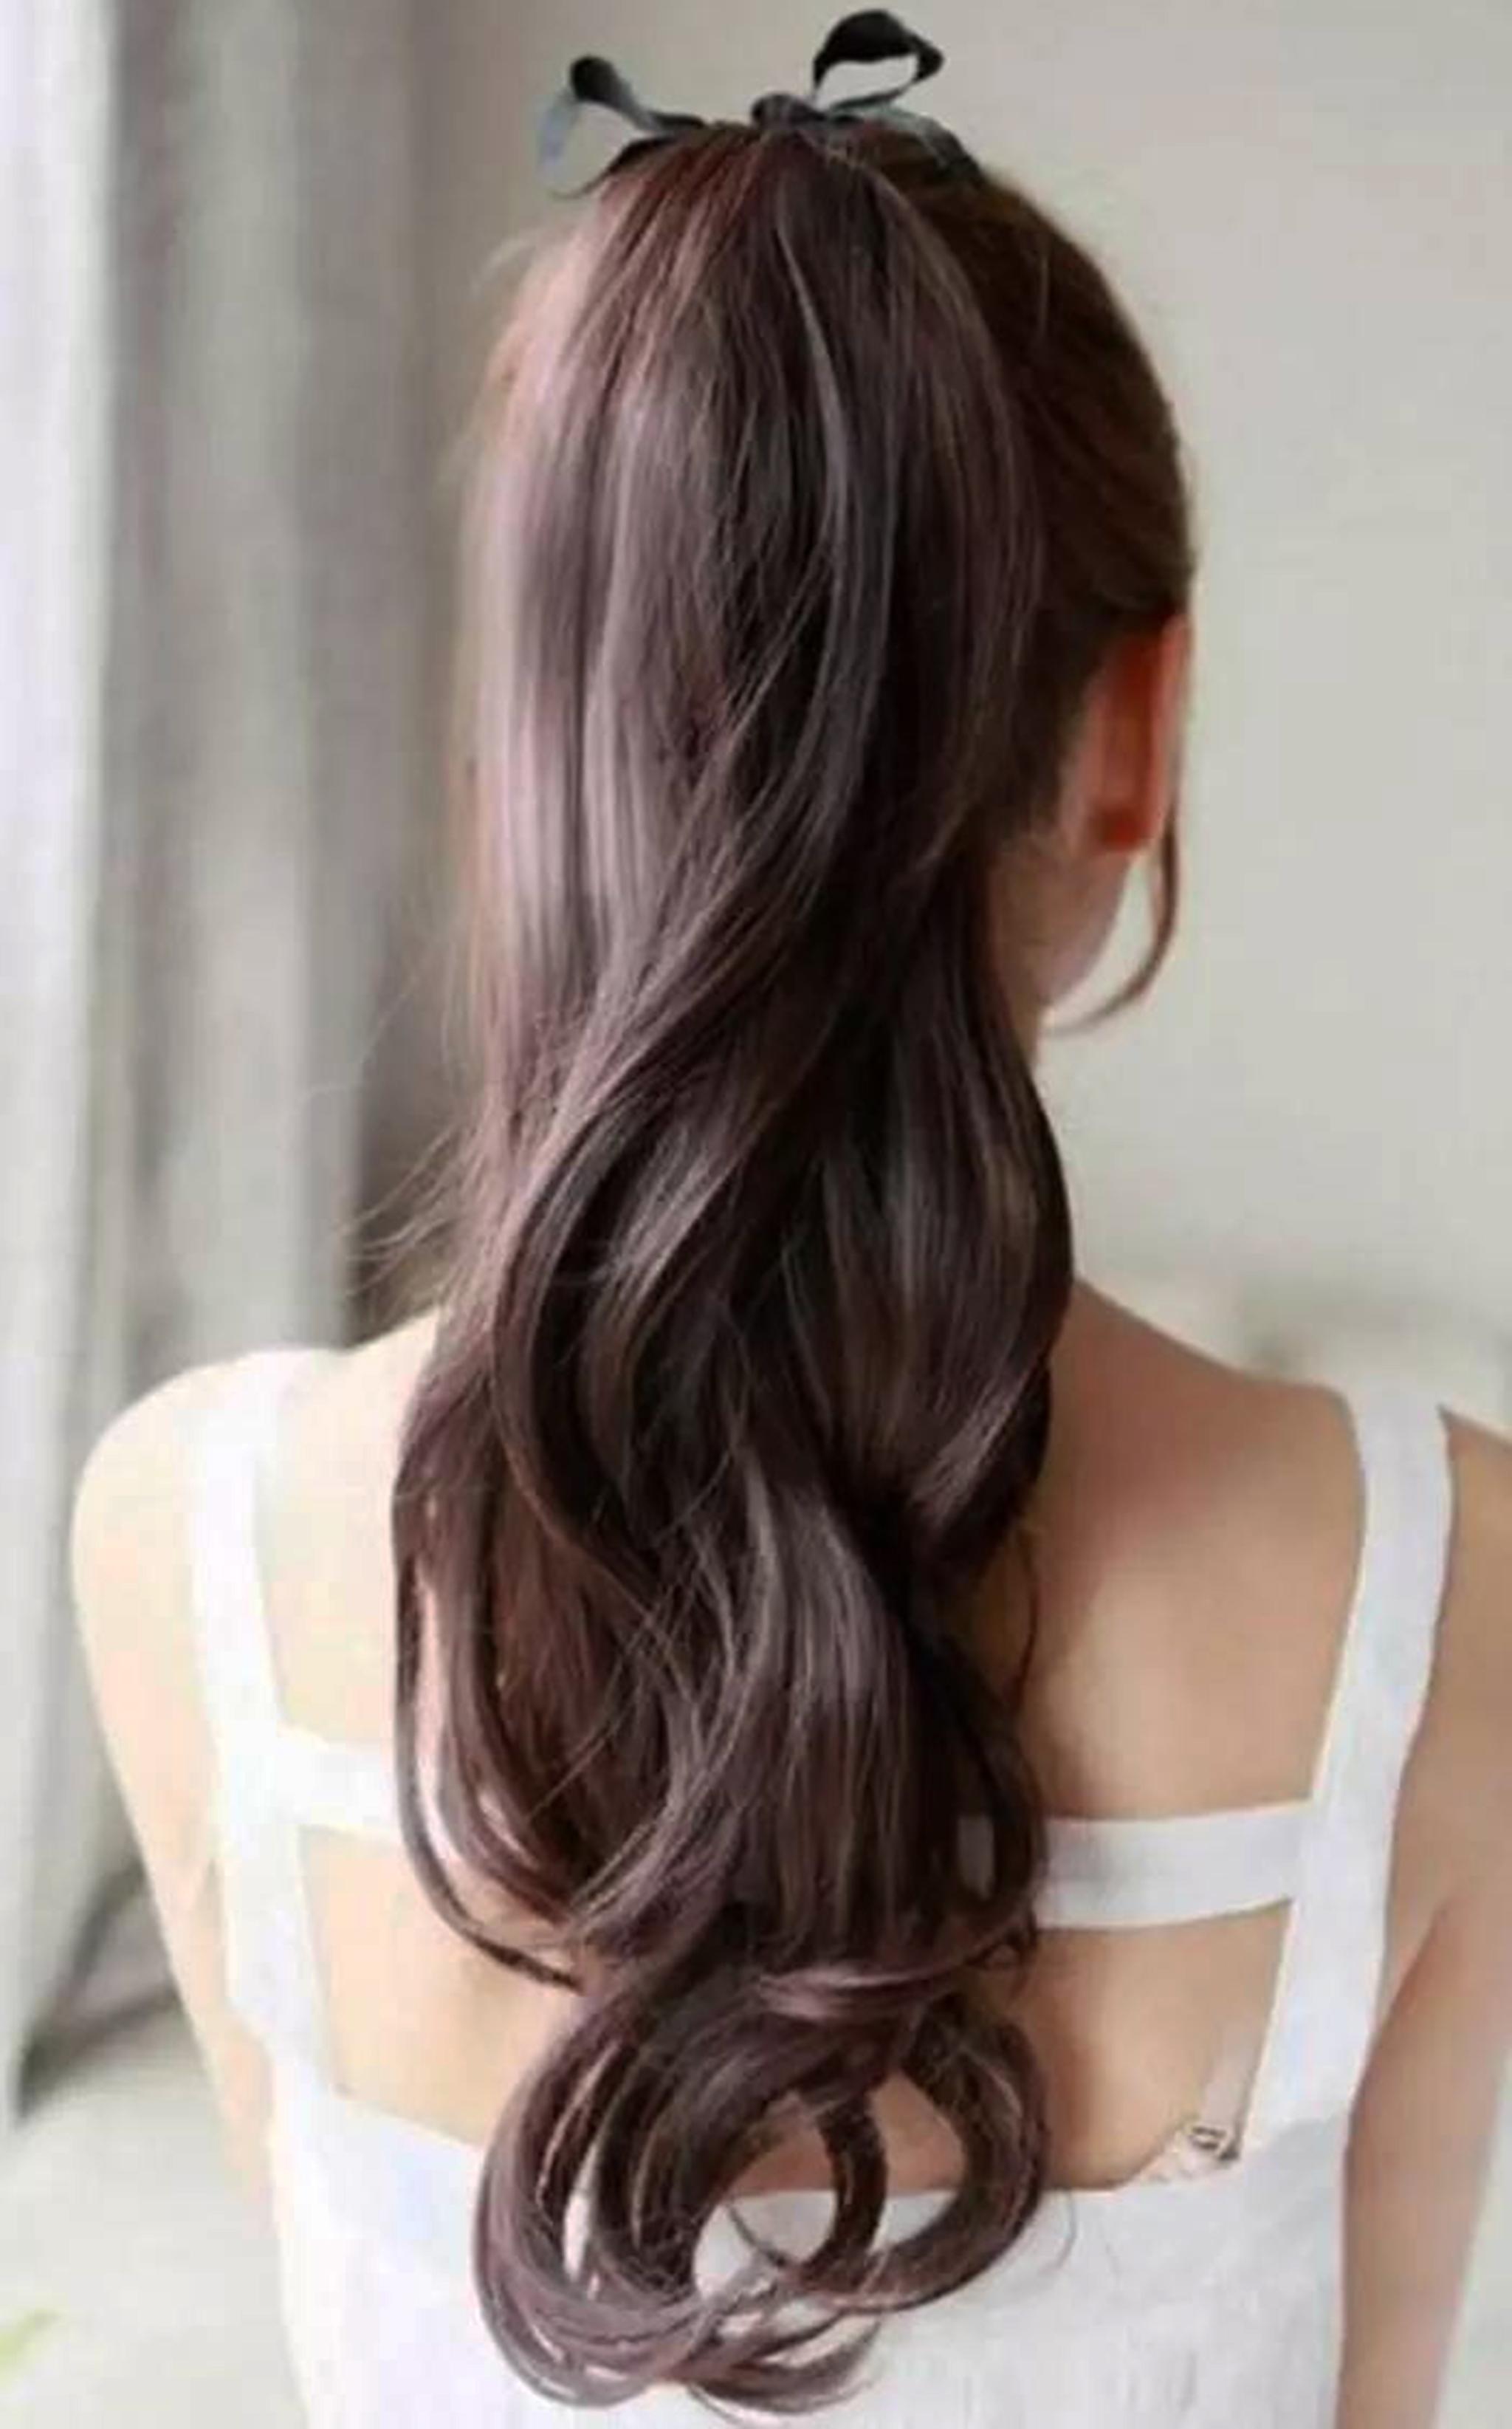 7 Ponytail Hairstyles Simple And Elegant Ponytails Hairstyles Step